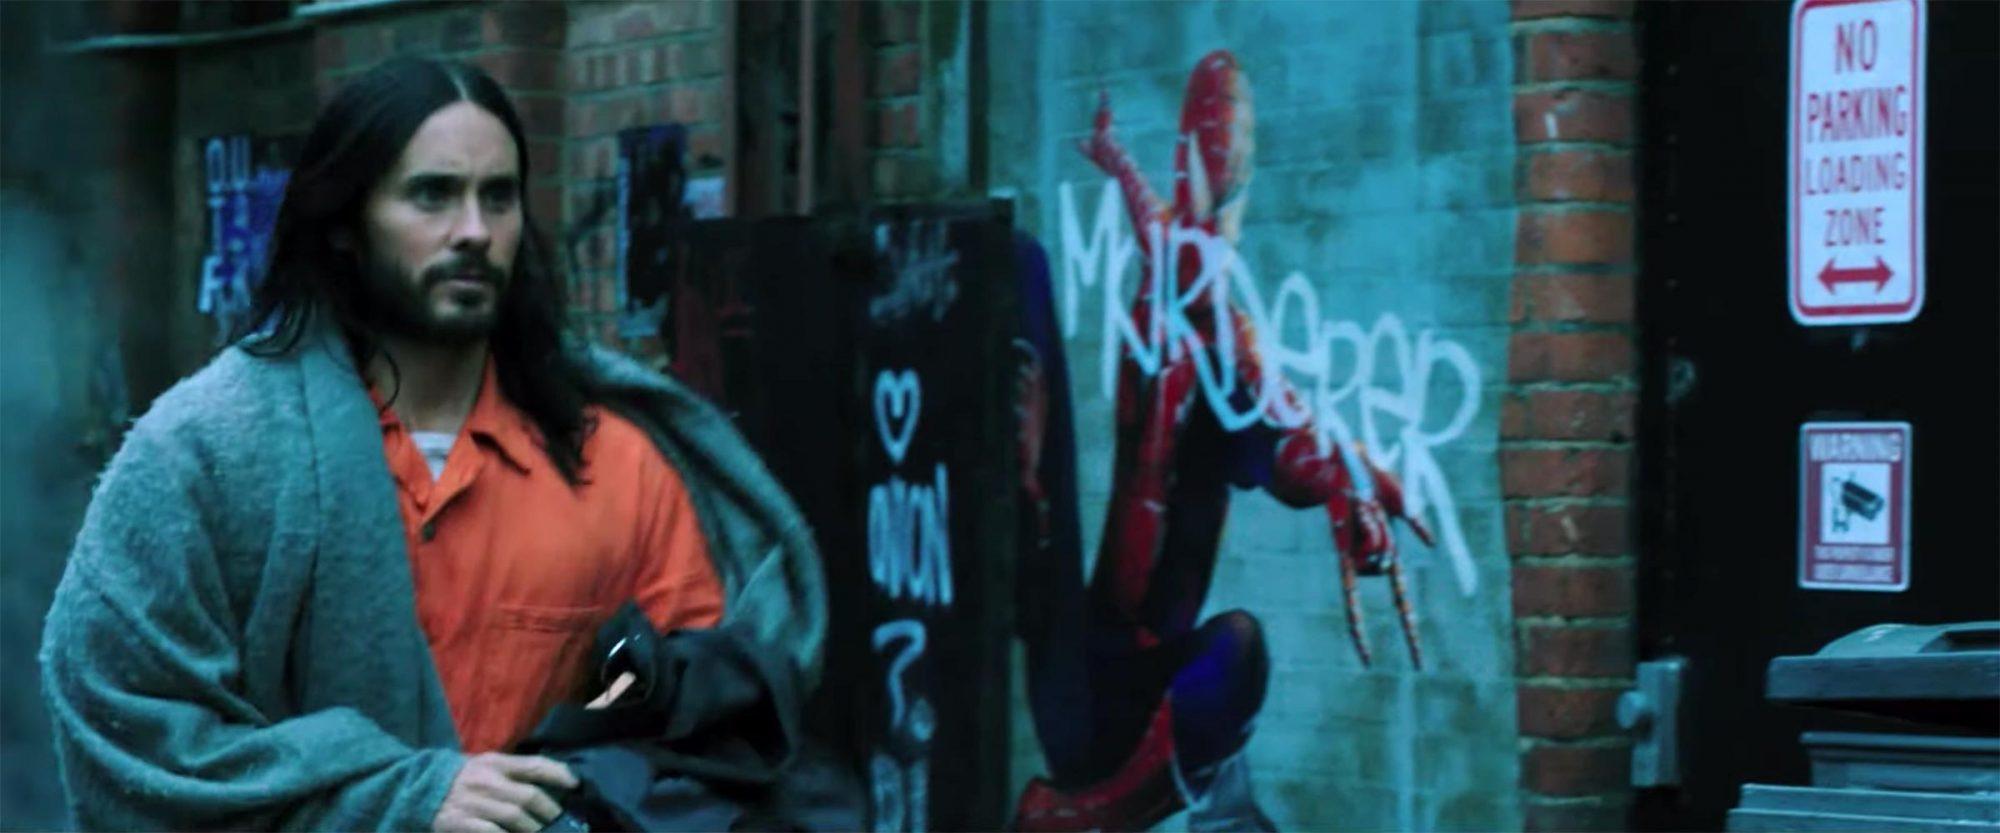 Morbius trailer turns Jared Leto into the Living Vampire | EW.com